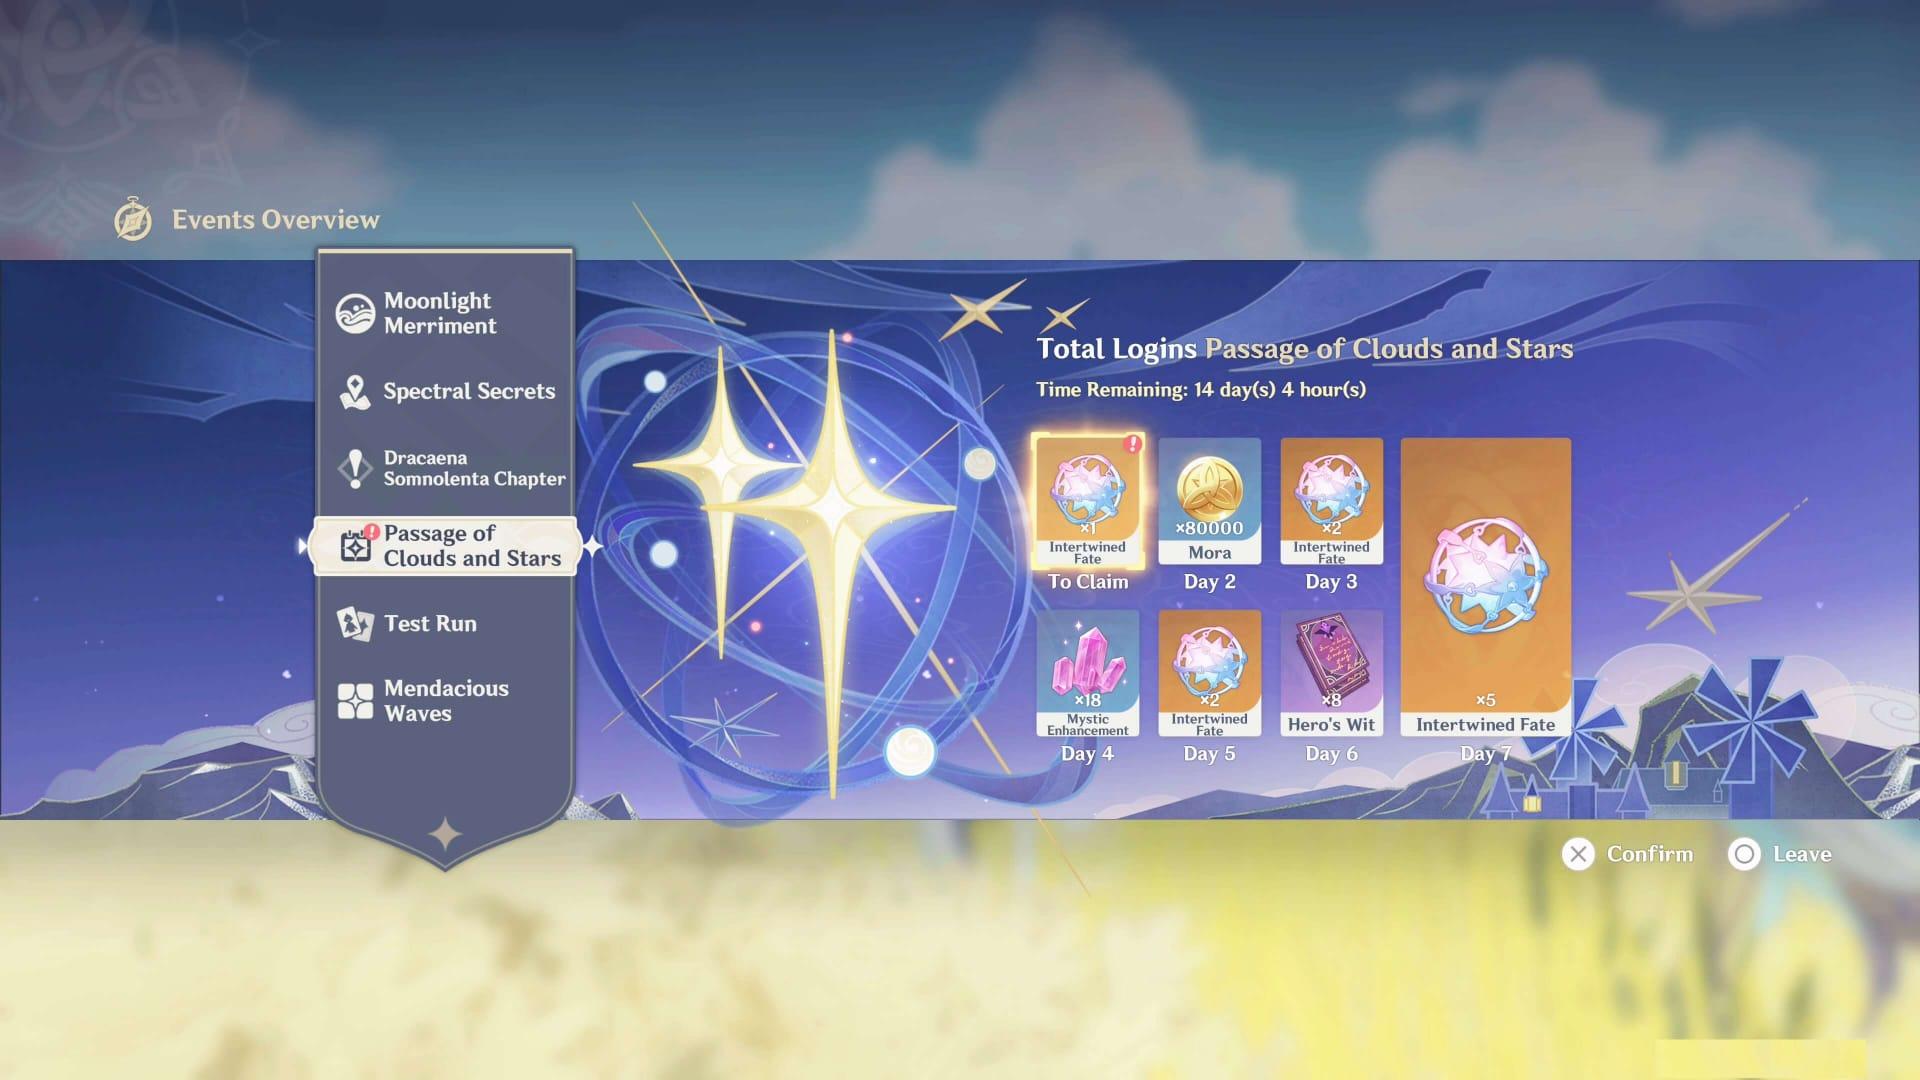 Genshin Impact Passage of Clouds and Stars Rewards